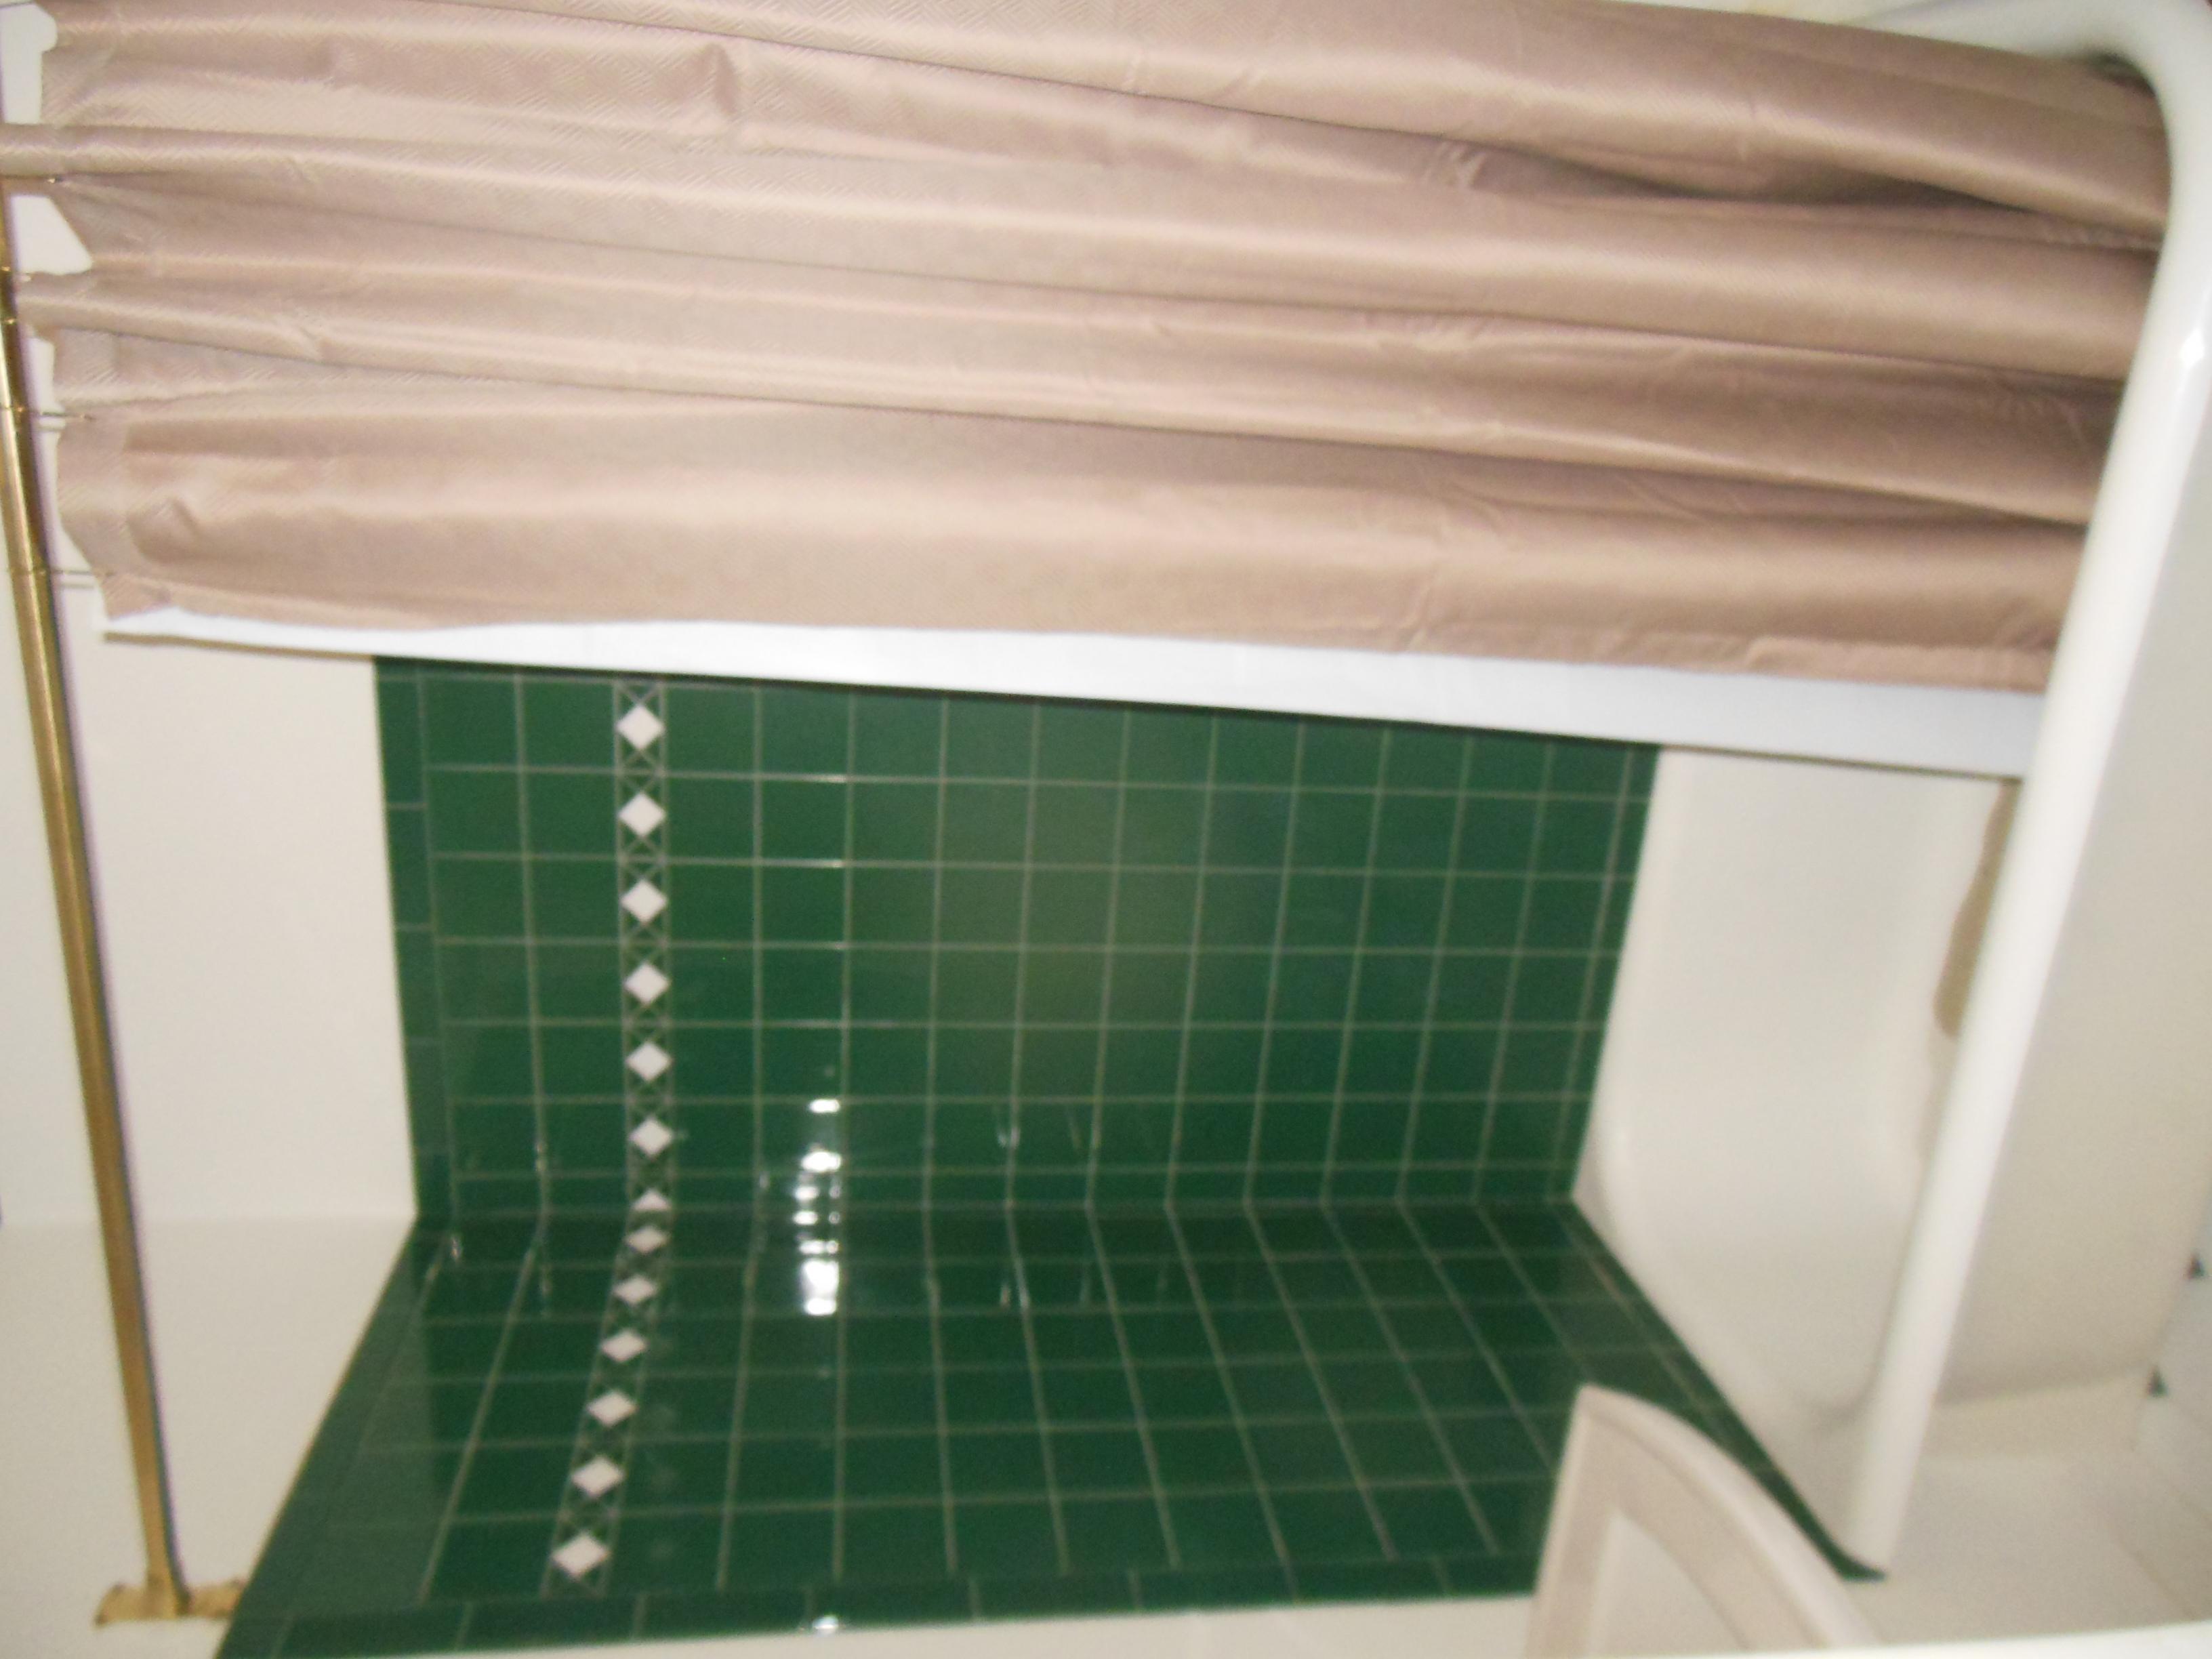 509 Normal, Upstairs bath